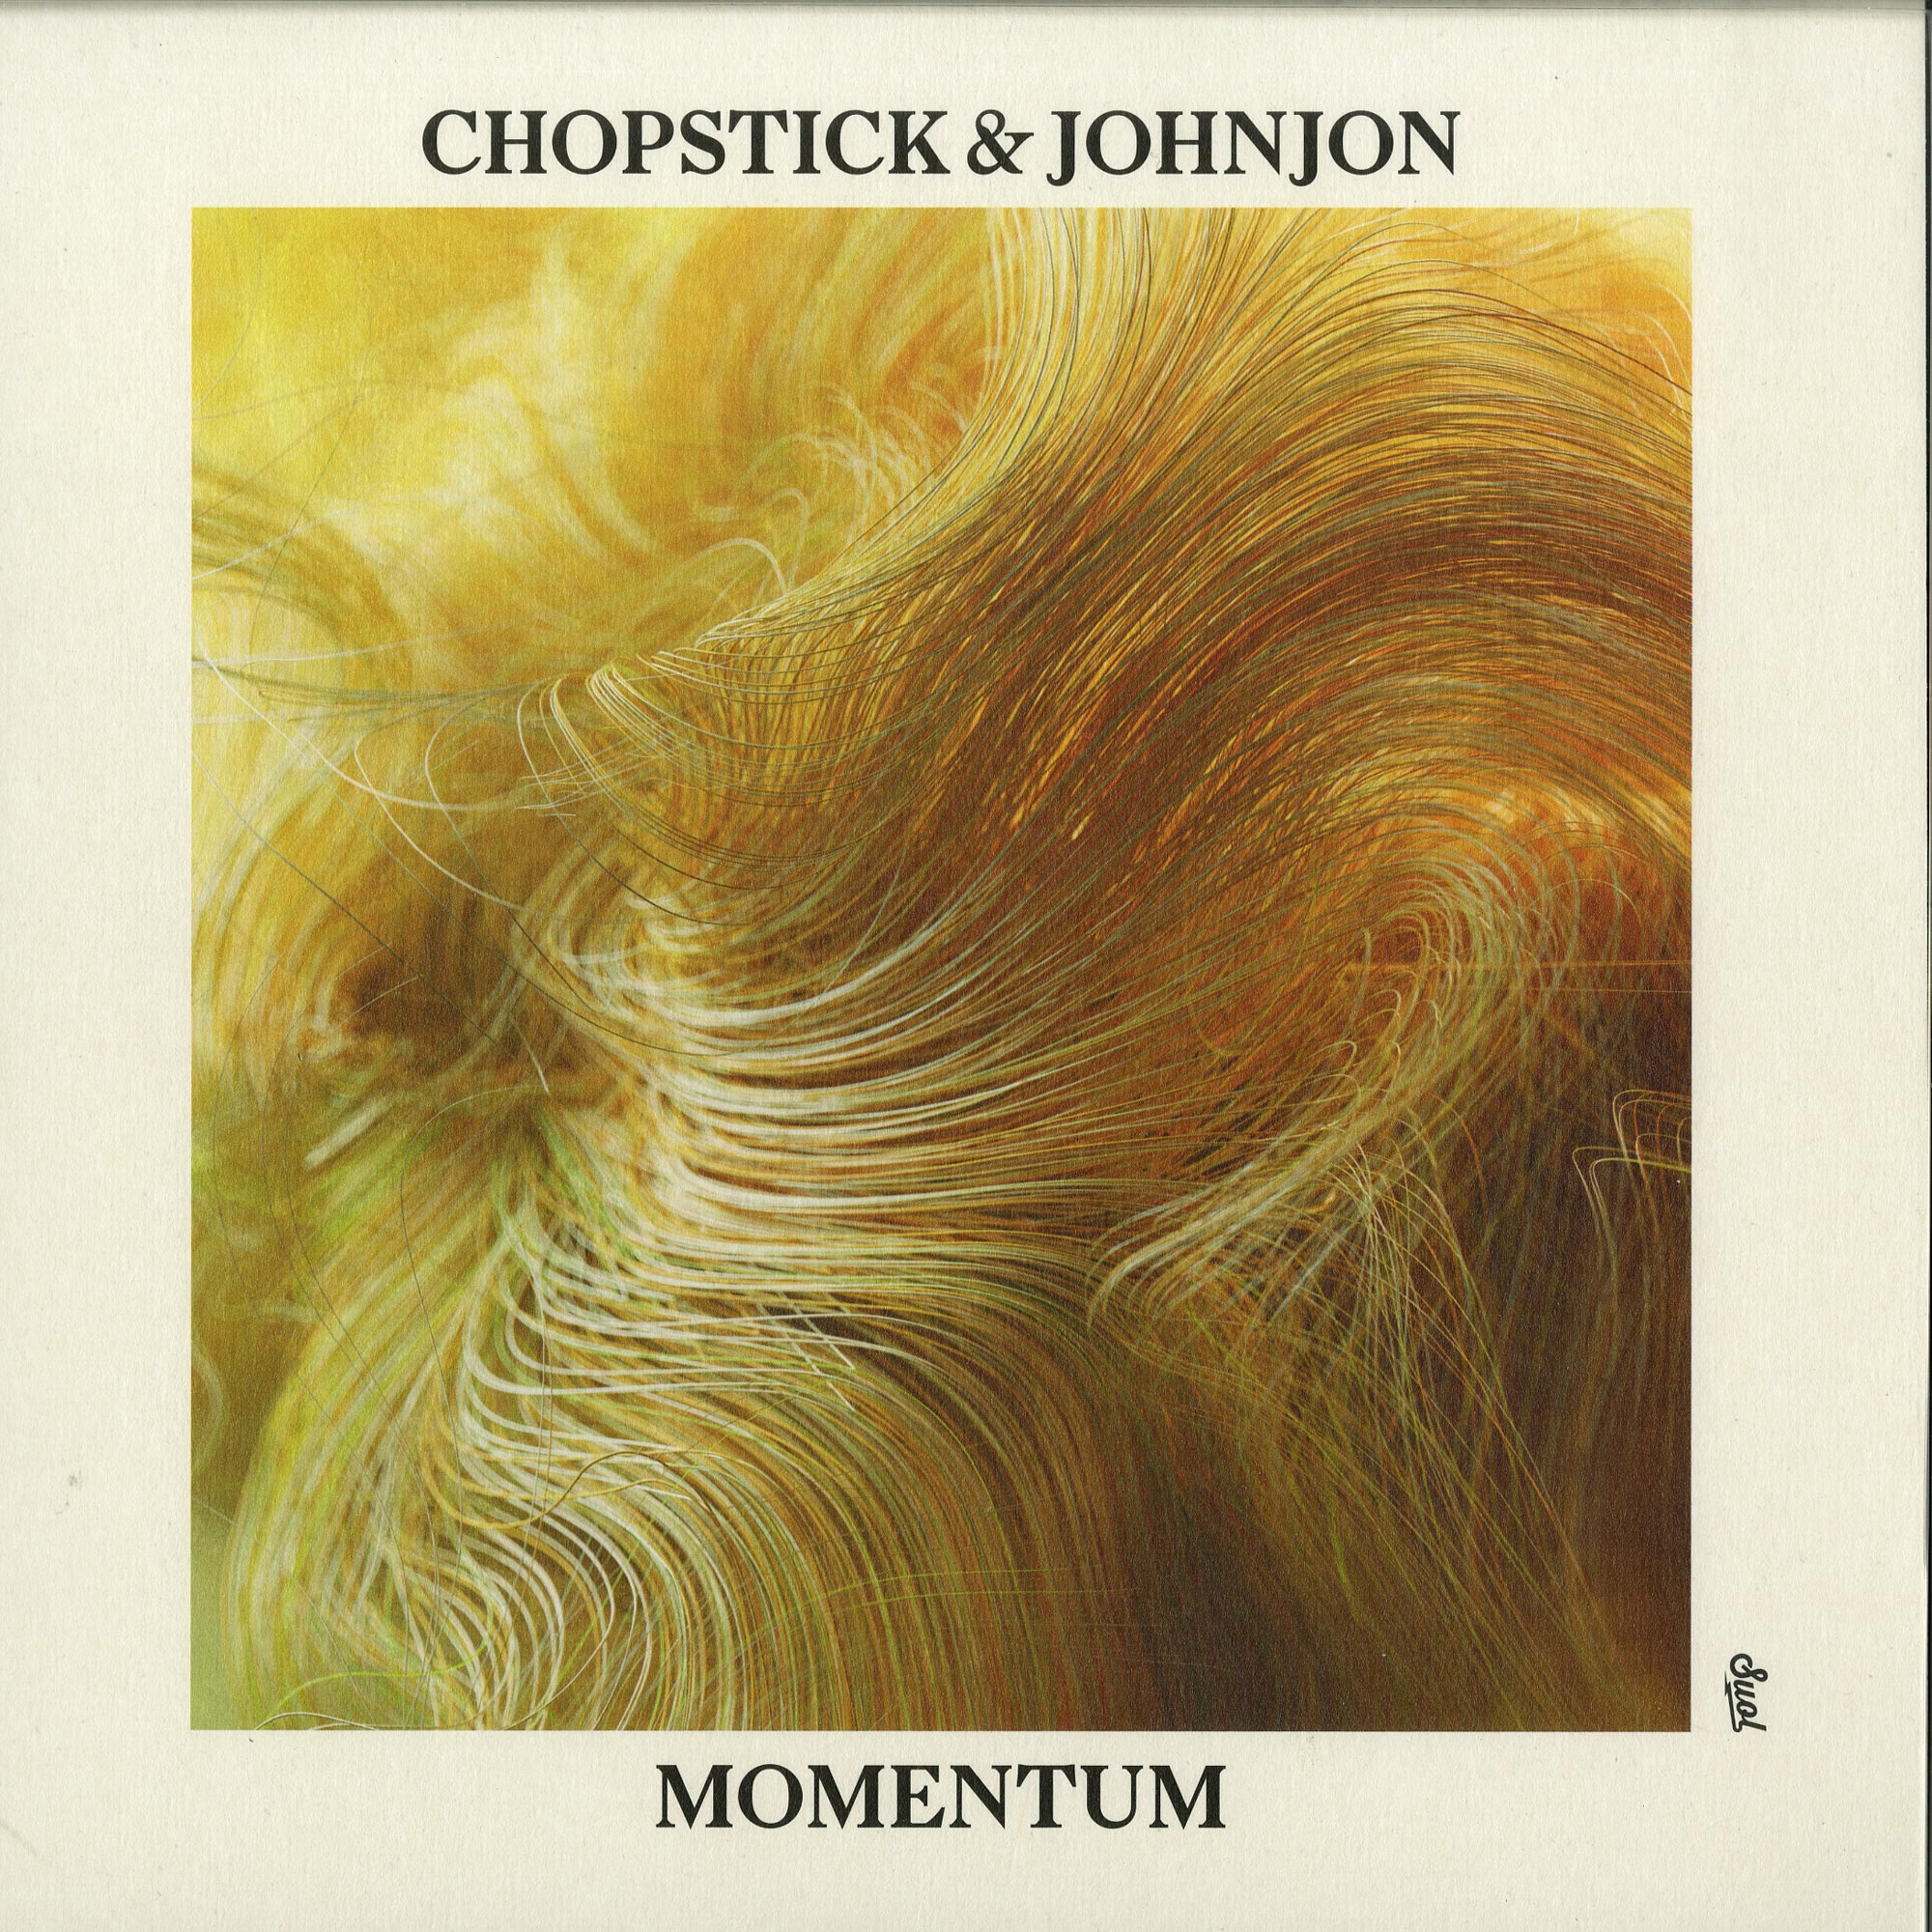 Chopstick & Johnjon - MOMENTUM EP